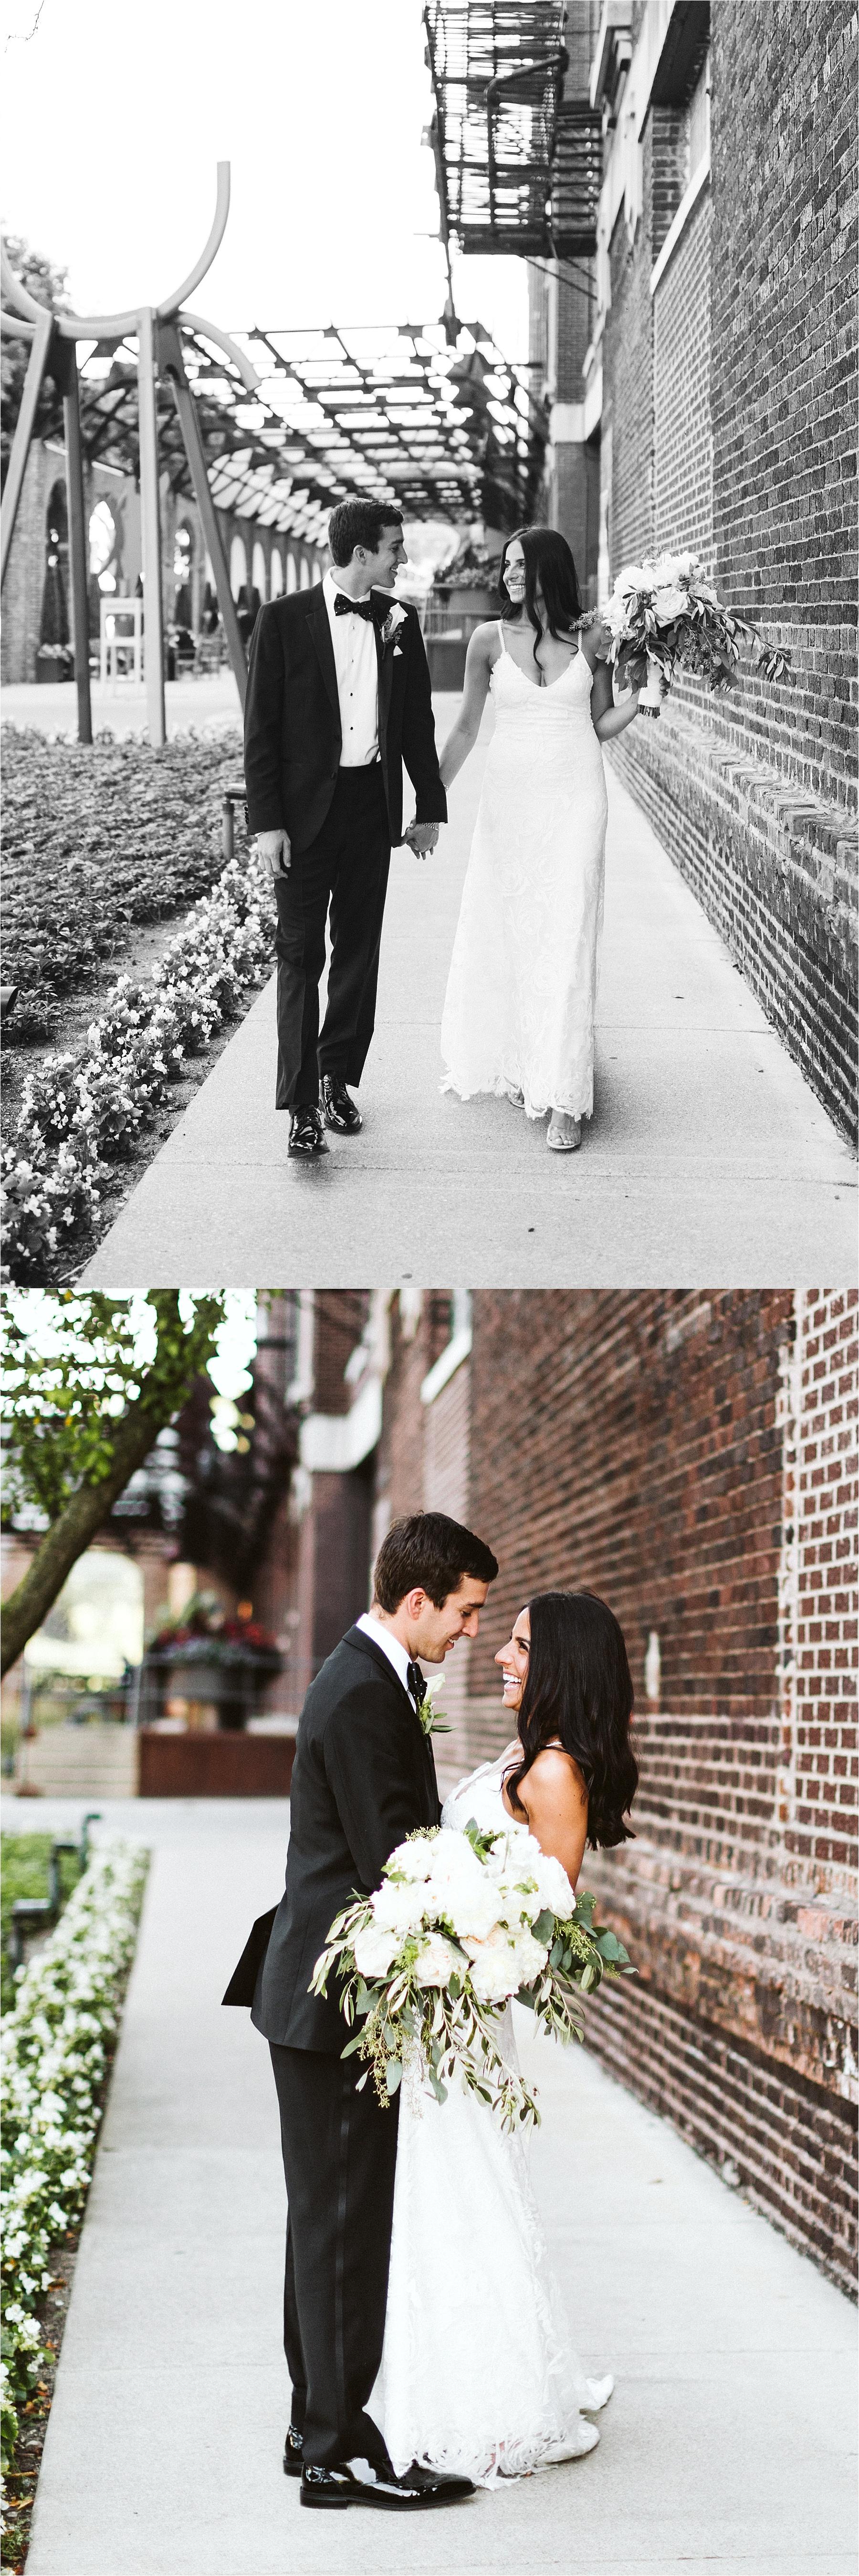 Bridgeport Art Center Wedding_0046.jpg